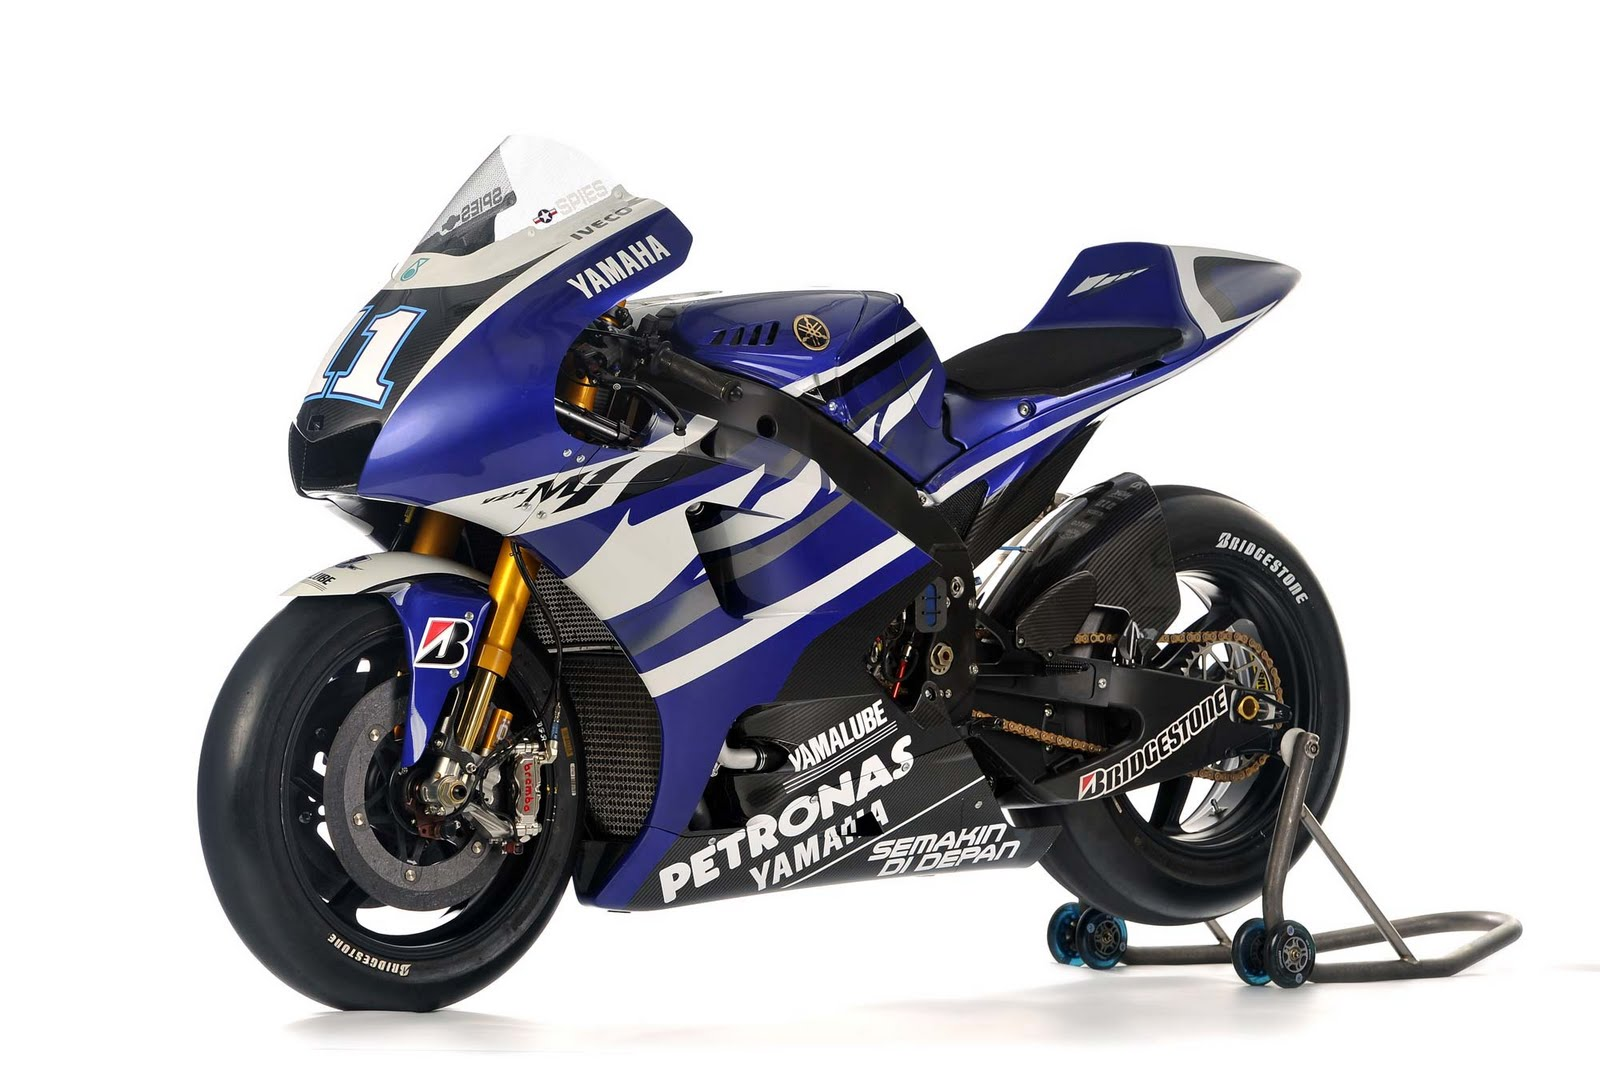 Yamaha YZR M1 MotoGP Wallpapers Bikes Cars Wallpapers 1600x1065